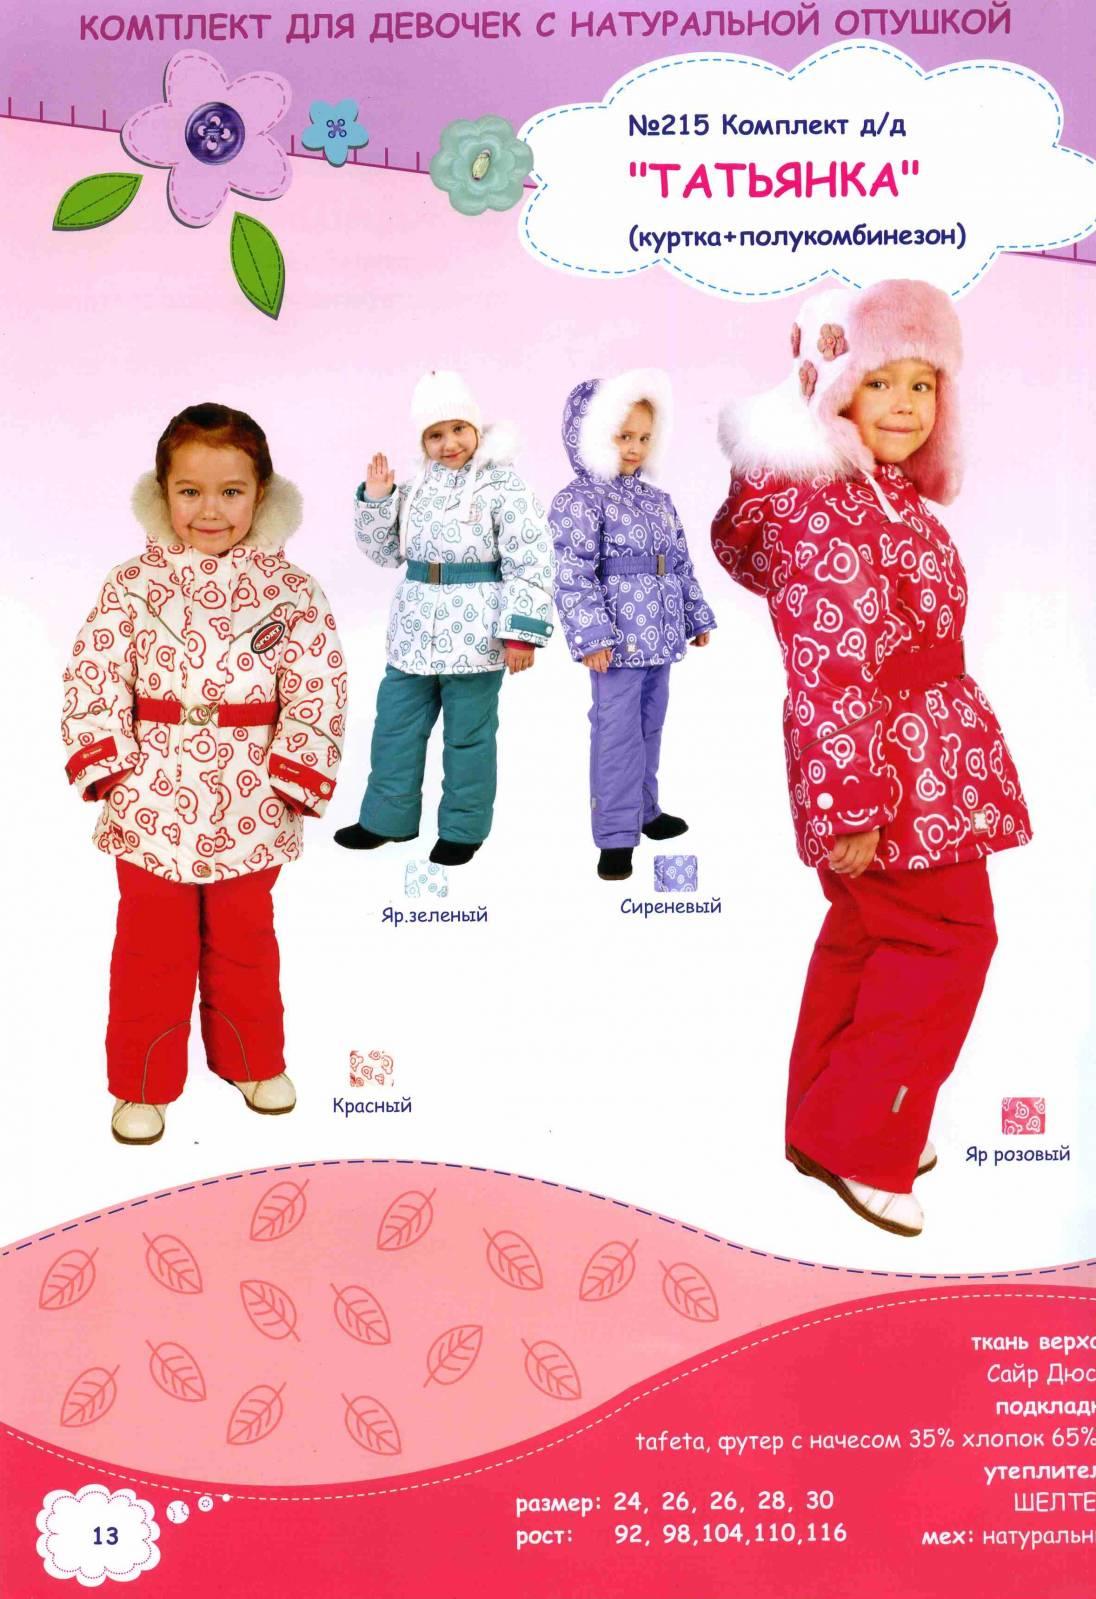 Coolclub Детская Одежда Каталог